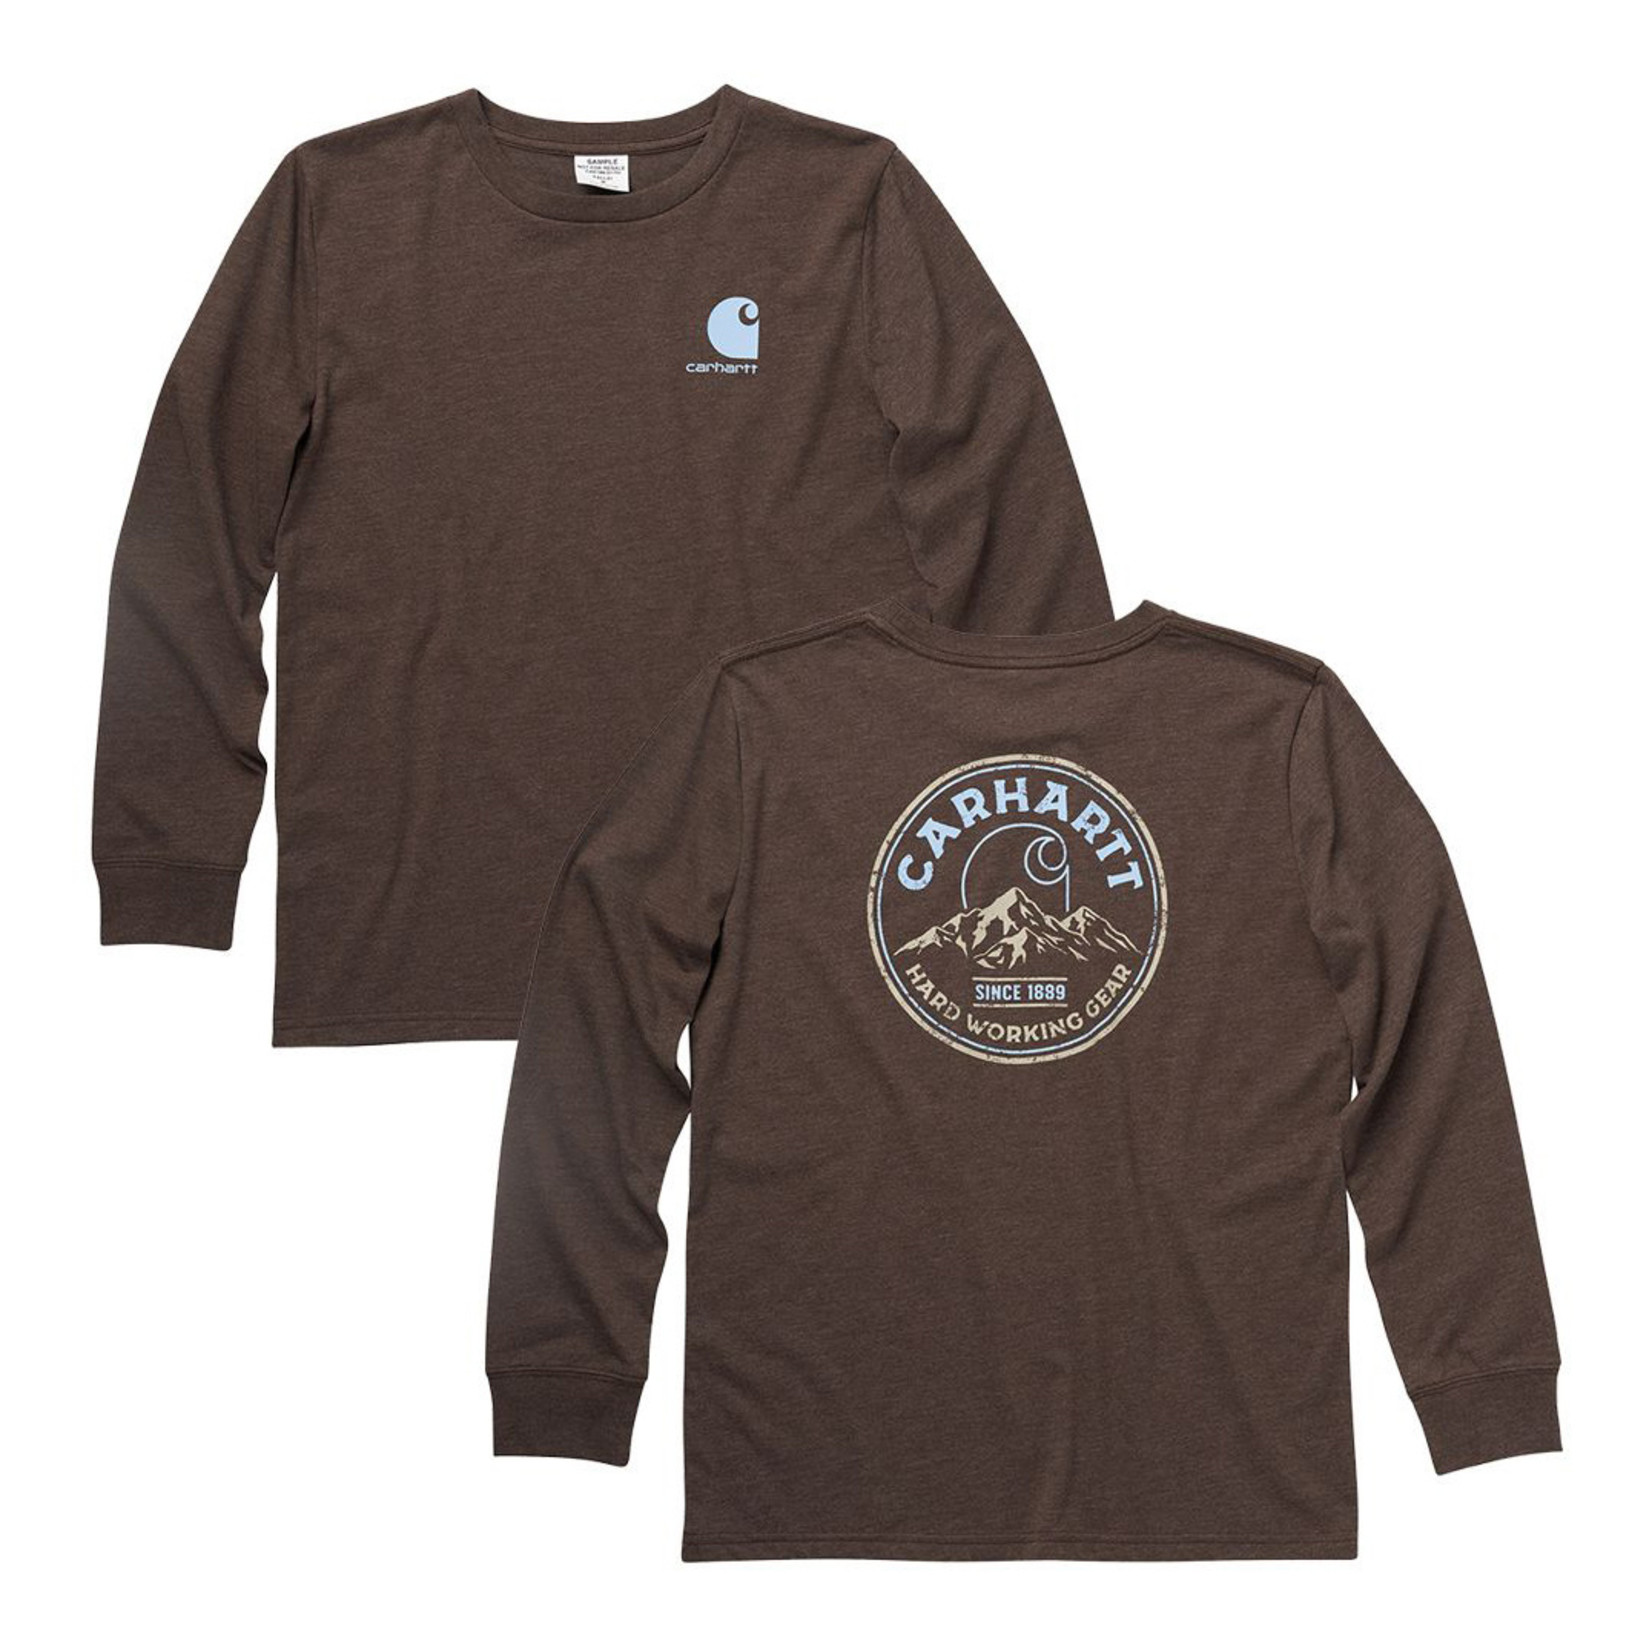 Carhartt Carhartt Boys CA6188 Long-Sleeve Graphic T-Shirt